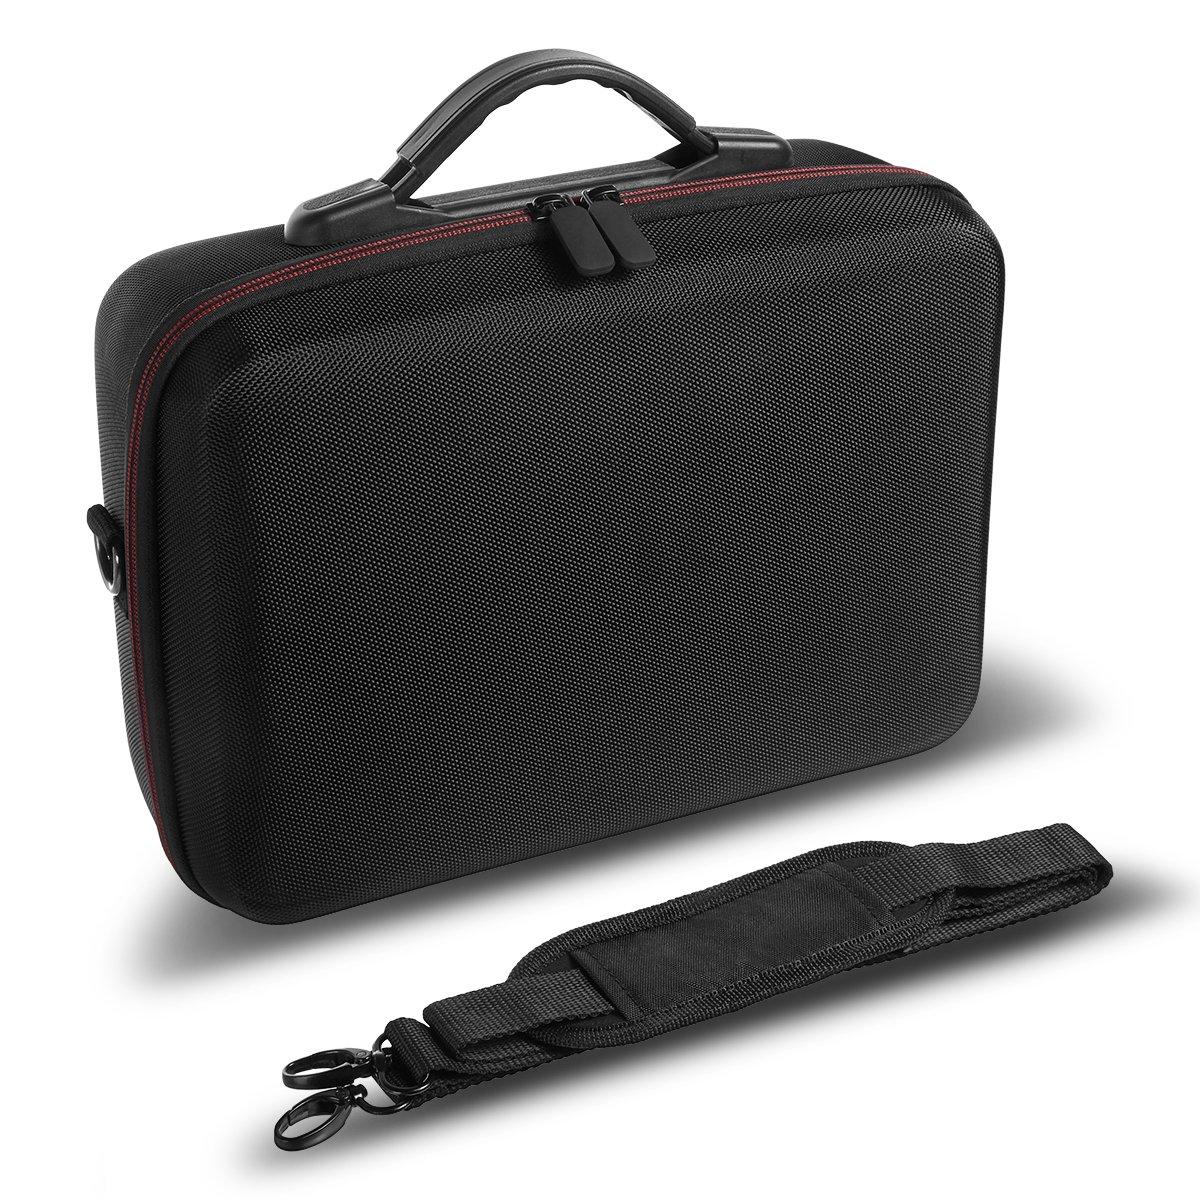 DJI Tello Carrying Case Hard EVA Travel Case Waterproof Portable Bag with Gamesir T1D Gamepad Remote Controller